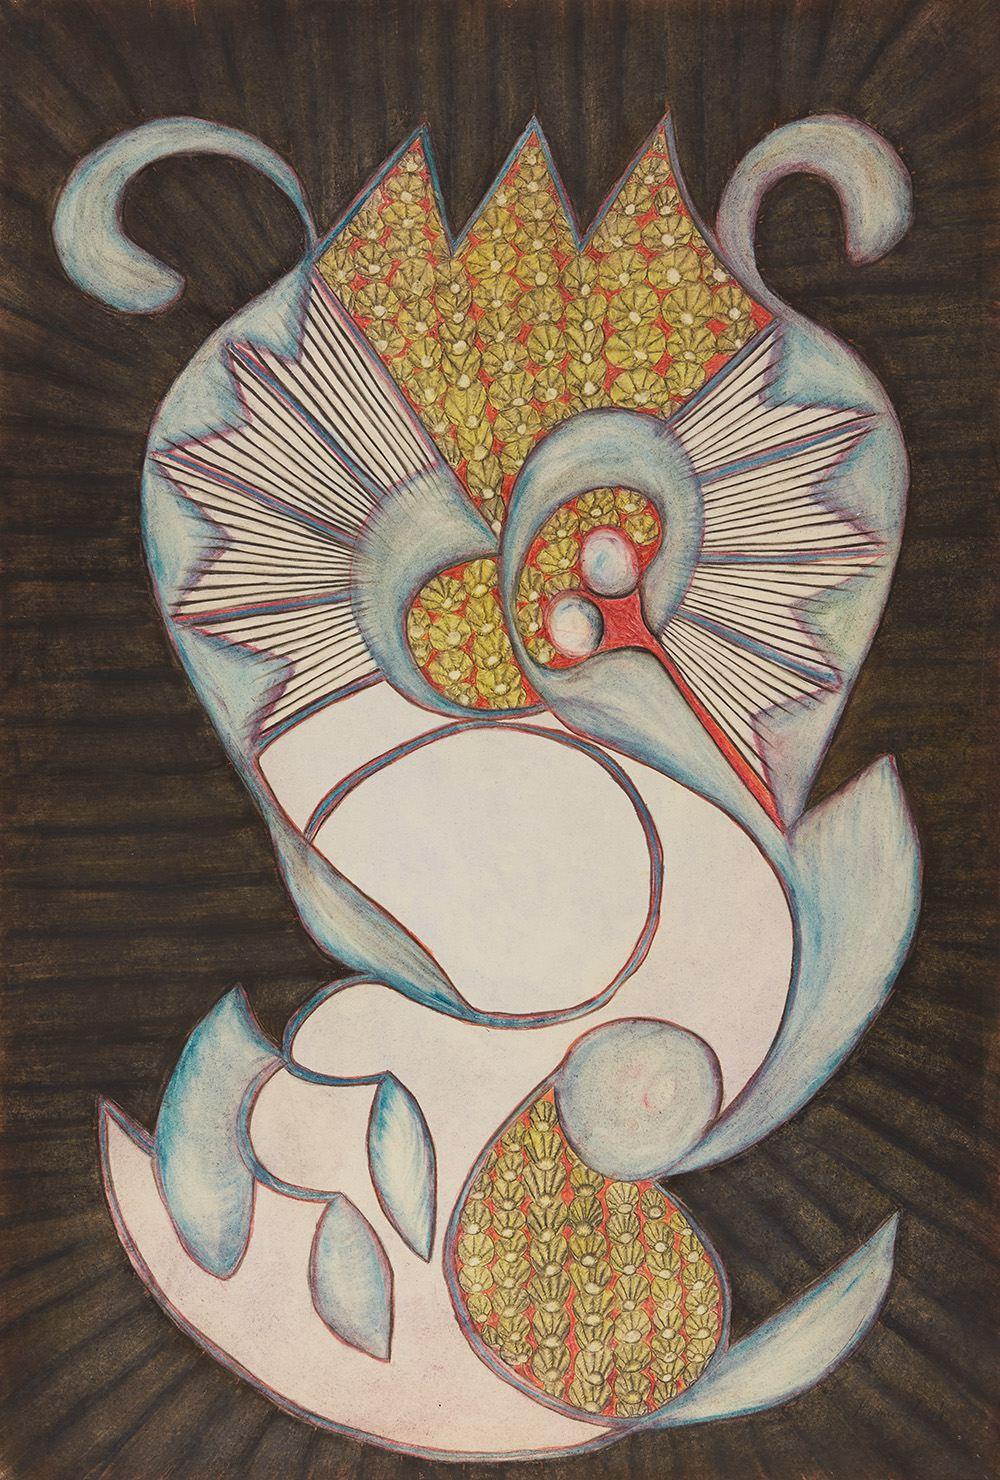 Anna Zemánková  Sláva a Prostota (Glory and Simplicity)  , 1966 Pastel, ballpoint pen on paper 33.07 x 23.23 inches 84 x 59 cm AZe 630